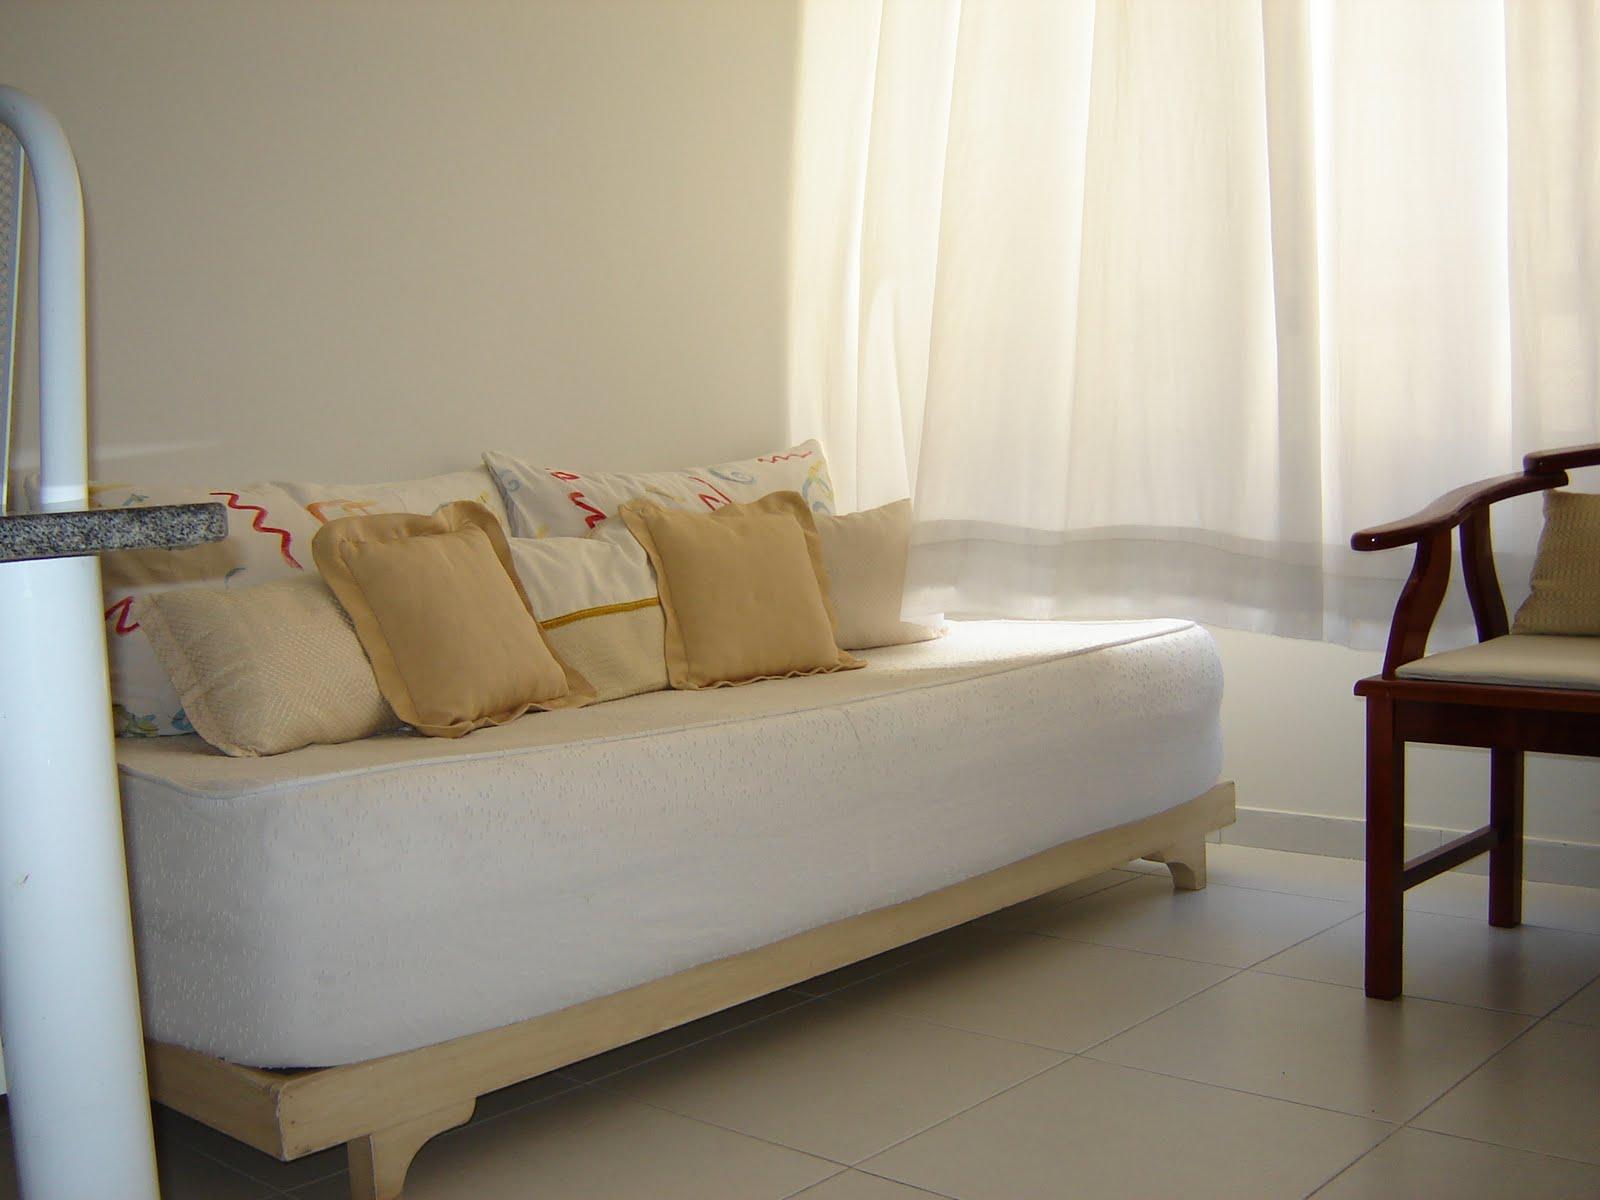 Sofa E Colchao Osasco Mainstay Faux Leather Sleeper Cantinho Da Vovó Jenny Bagunça Arrumadinha